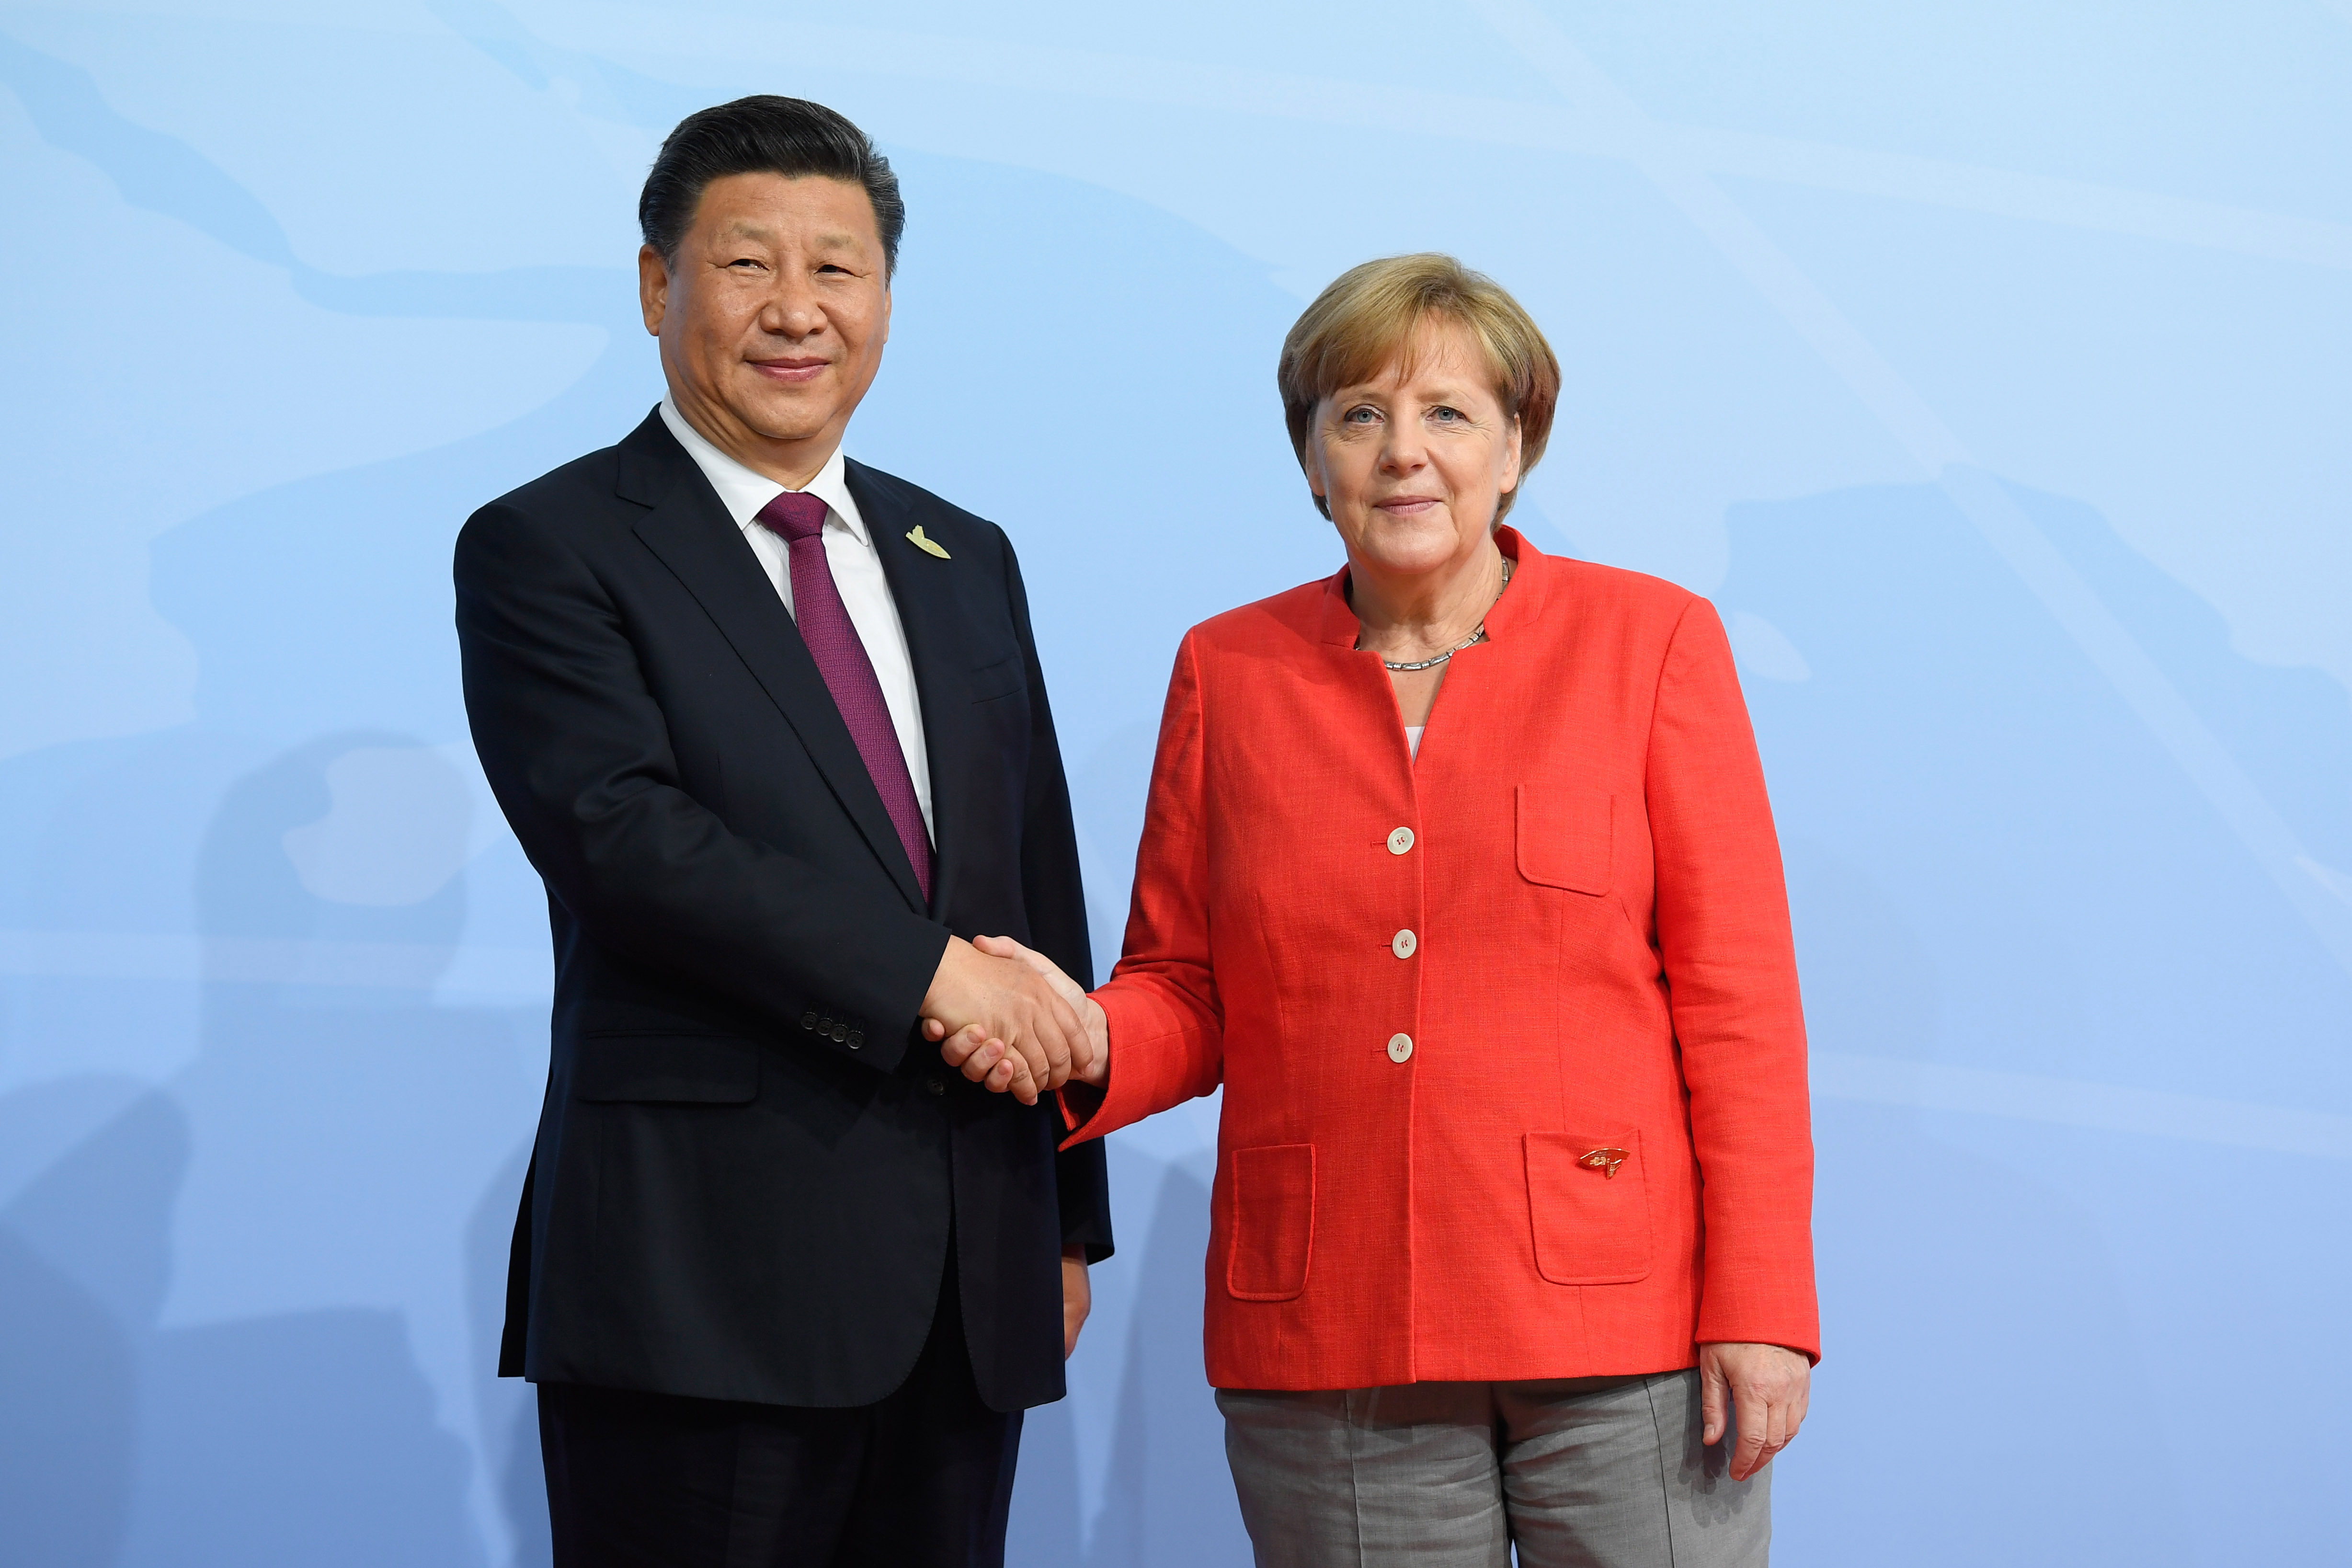 Rozmowa Merkel-Xi Jinping